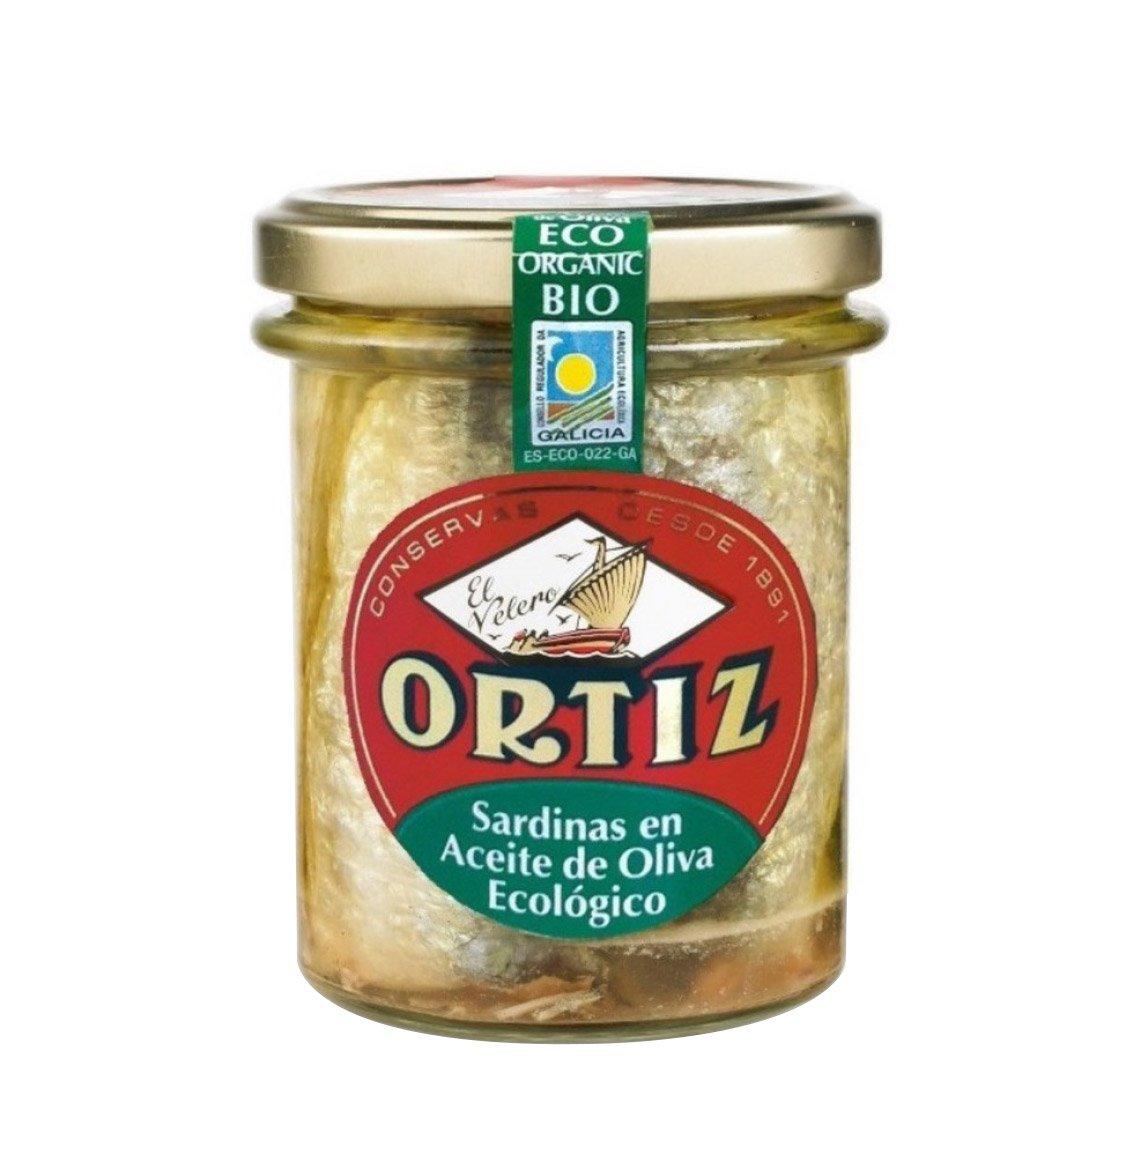 Ortiz Sardines in Organic Bio Olive Oil 190g